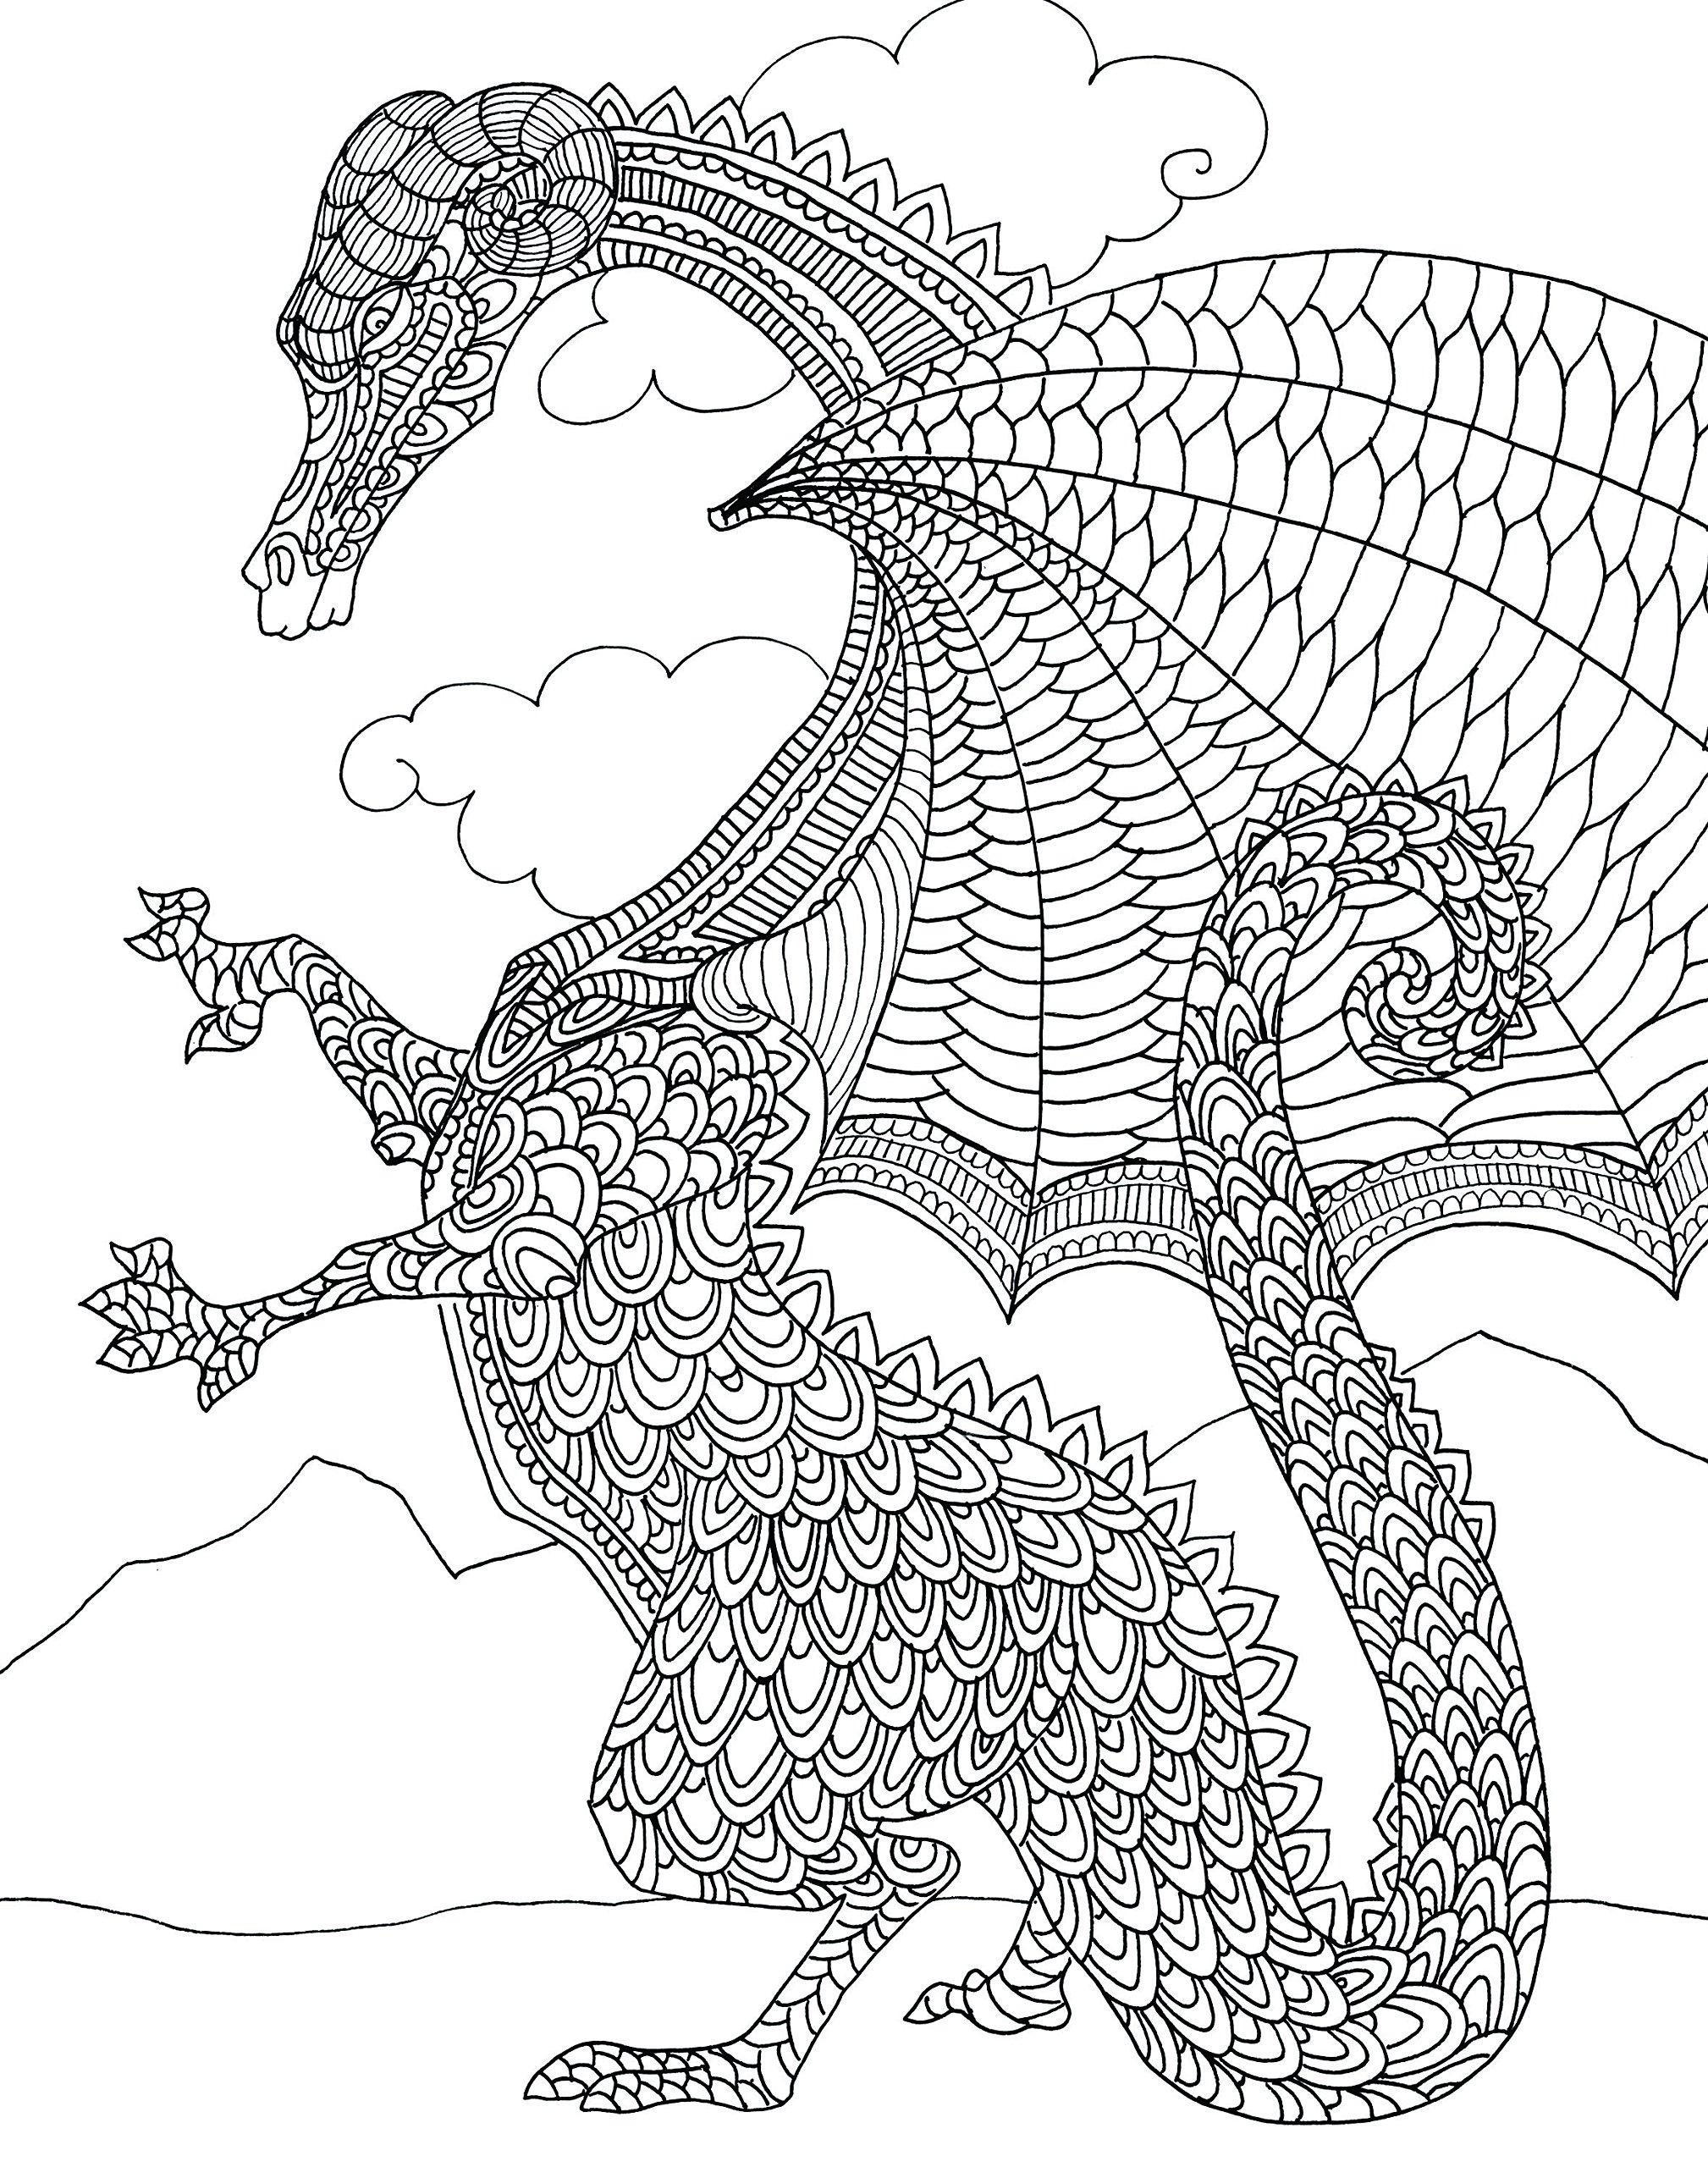 Amazon Zendoodle Coloring Majestic Dragons Deluxe Edition With Pencils 9781250126733 Antonia Cardella Books